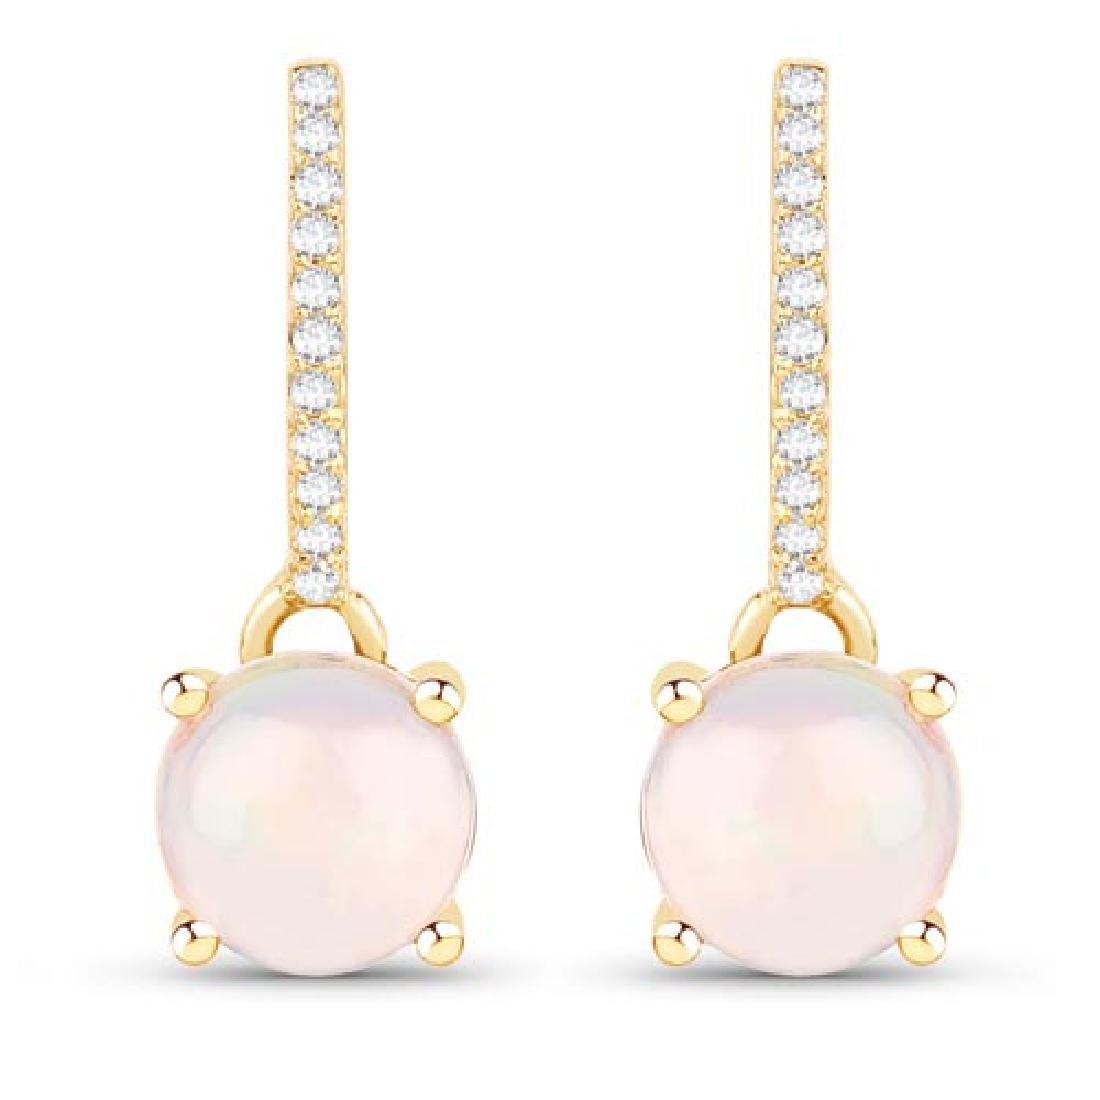 1.07 CTW Genuine Ethiopian Opal and White Diamond 14K Y